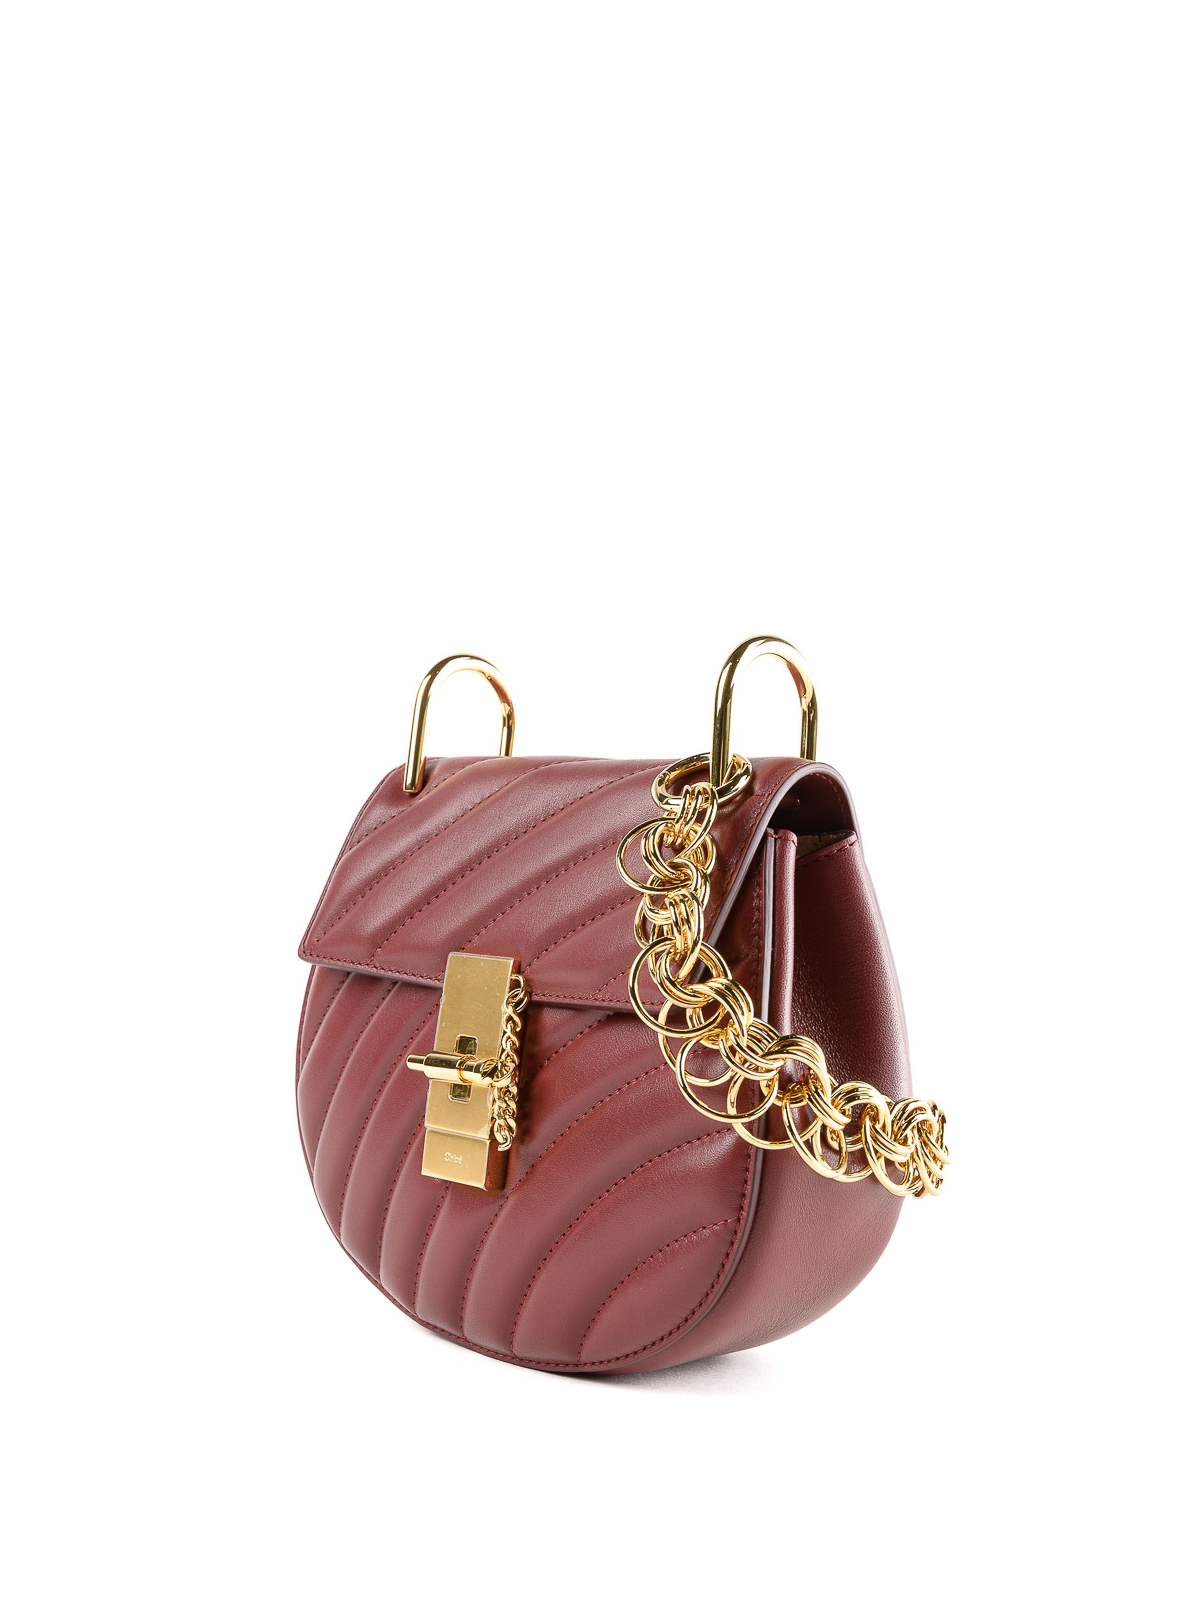 ac133a19047 Drew Bijou Mini quilted leather bag shop online  CHLOE · CHLOE · CHLOE ·  CHLOE